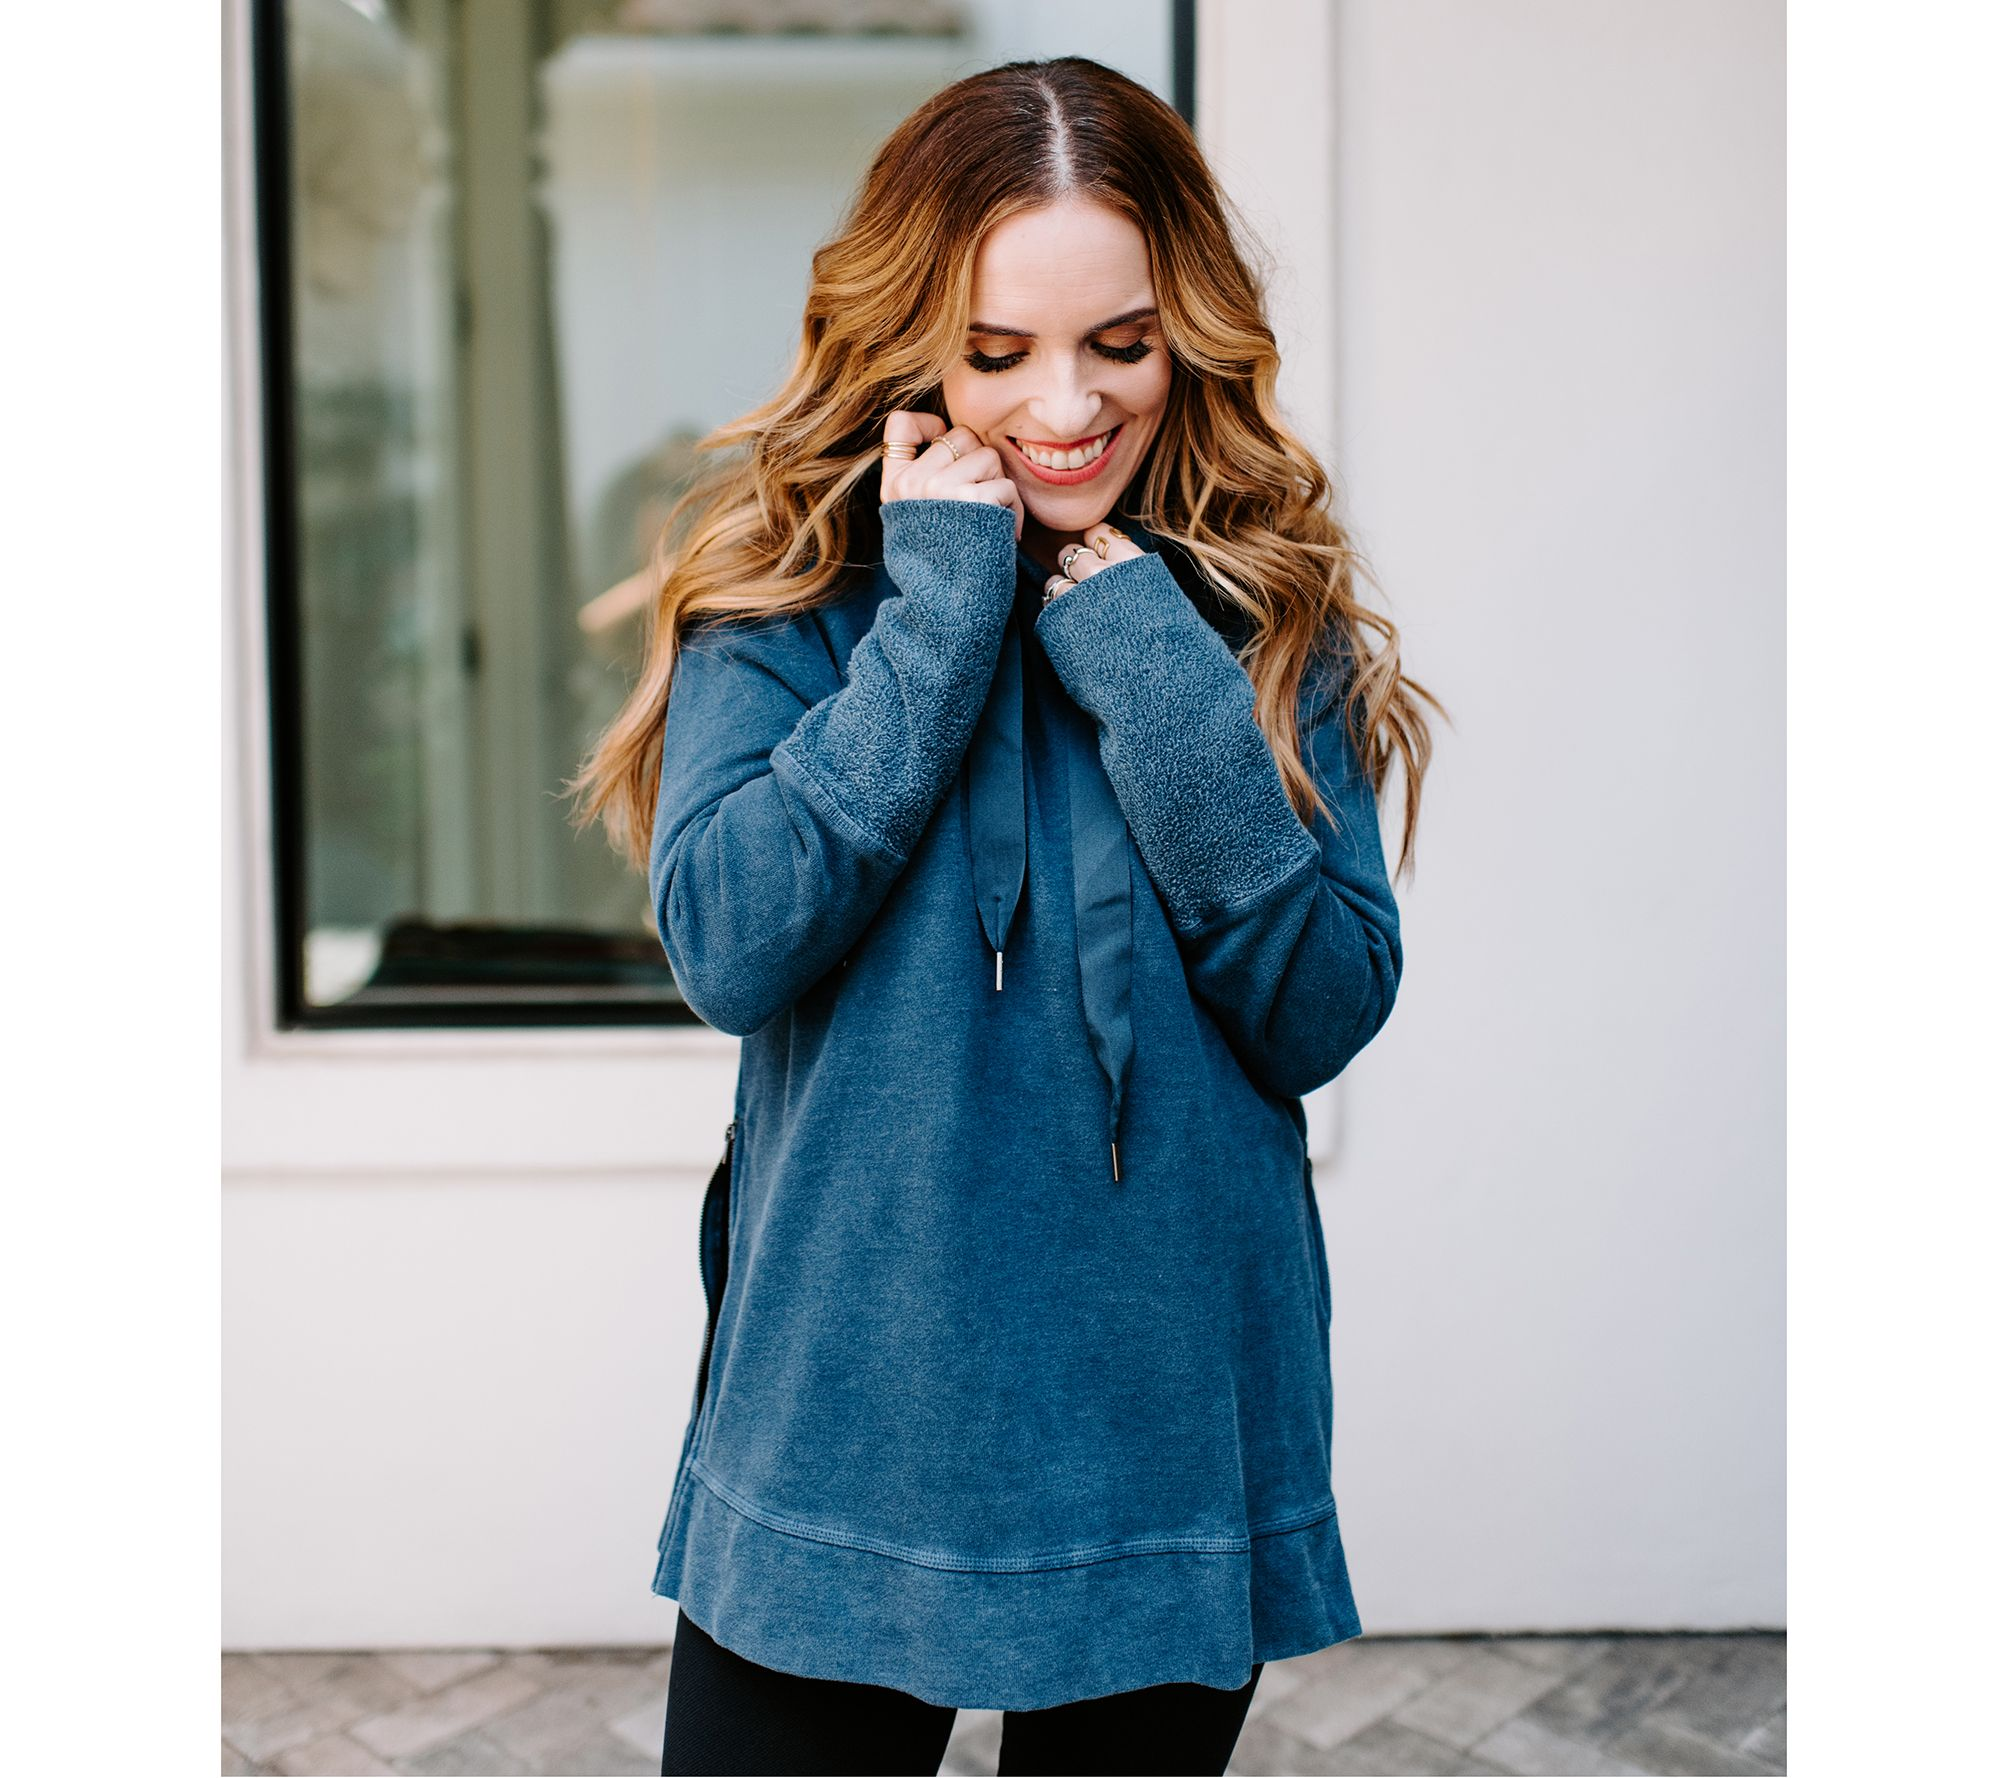 Rachel Hollis Ltd Hooded Sweatshirt With Side Zip Detail by Rachel Hollis Ltd